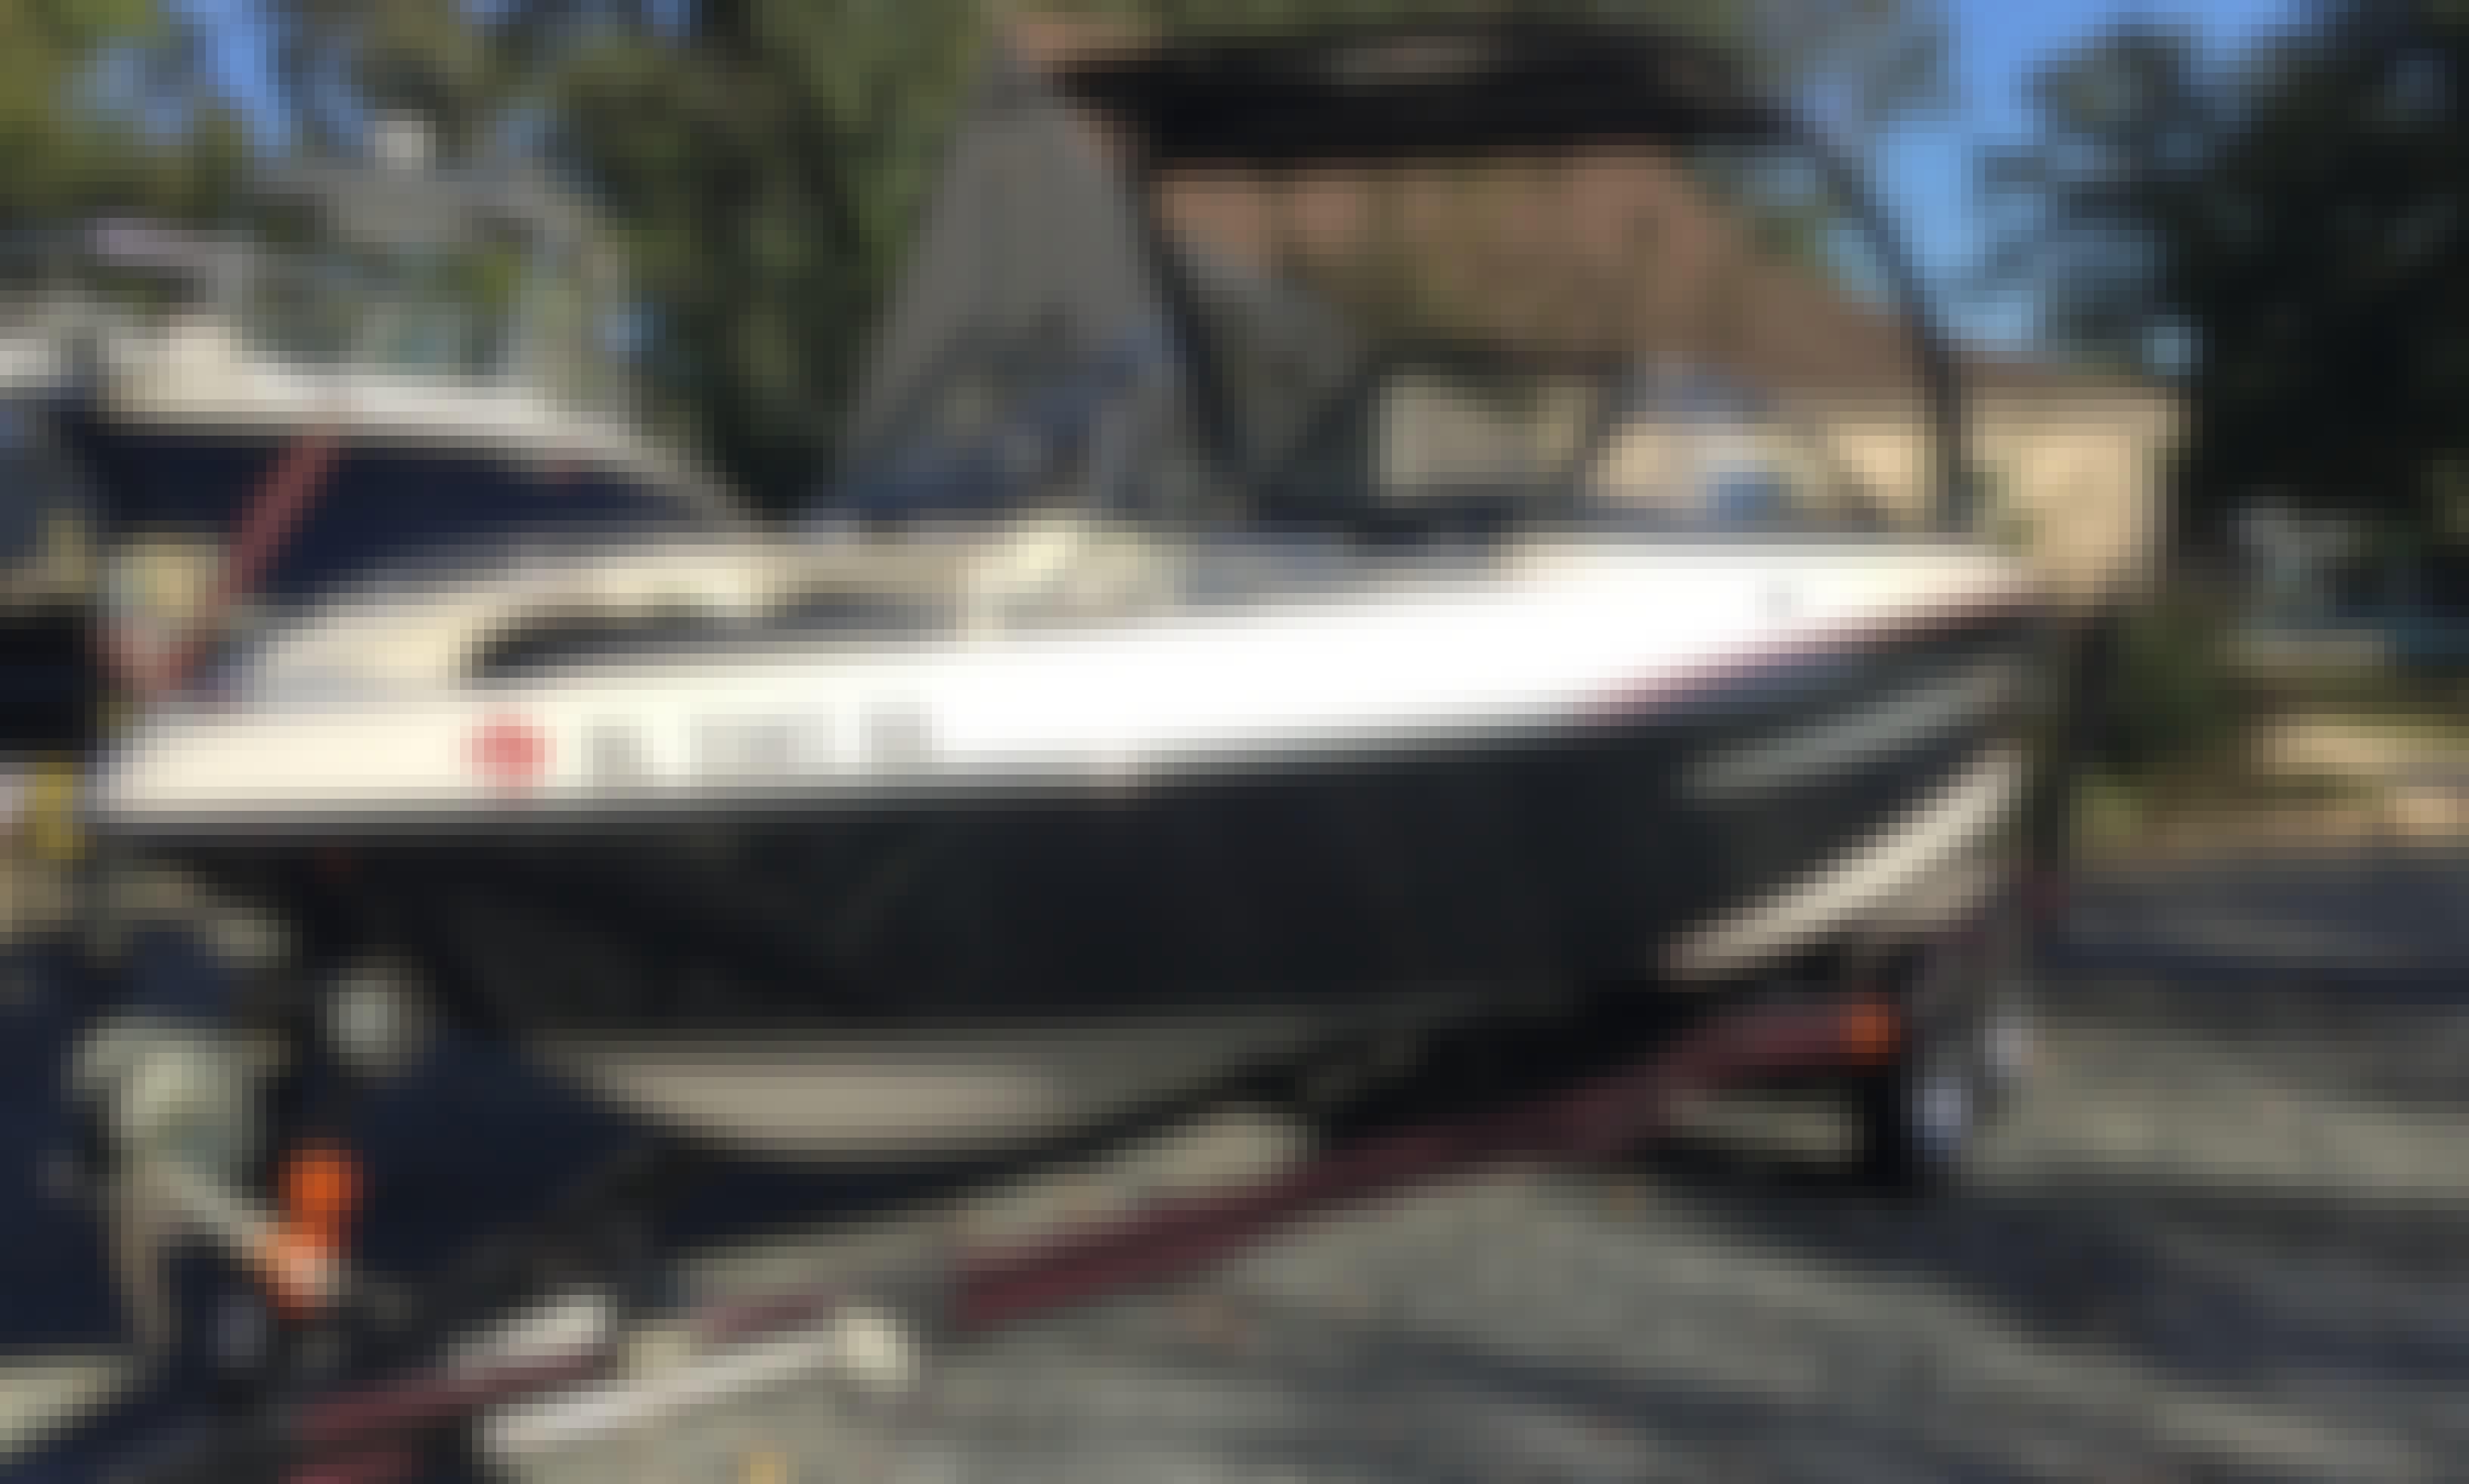 Stunning Malibu 22' Surf/Wake/Waterski Boat! For up to 8 people